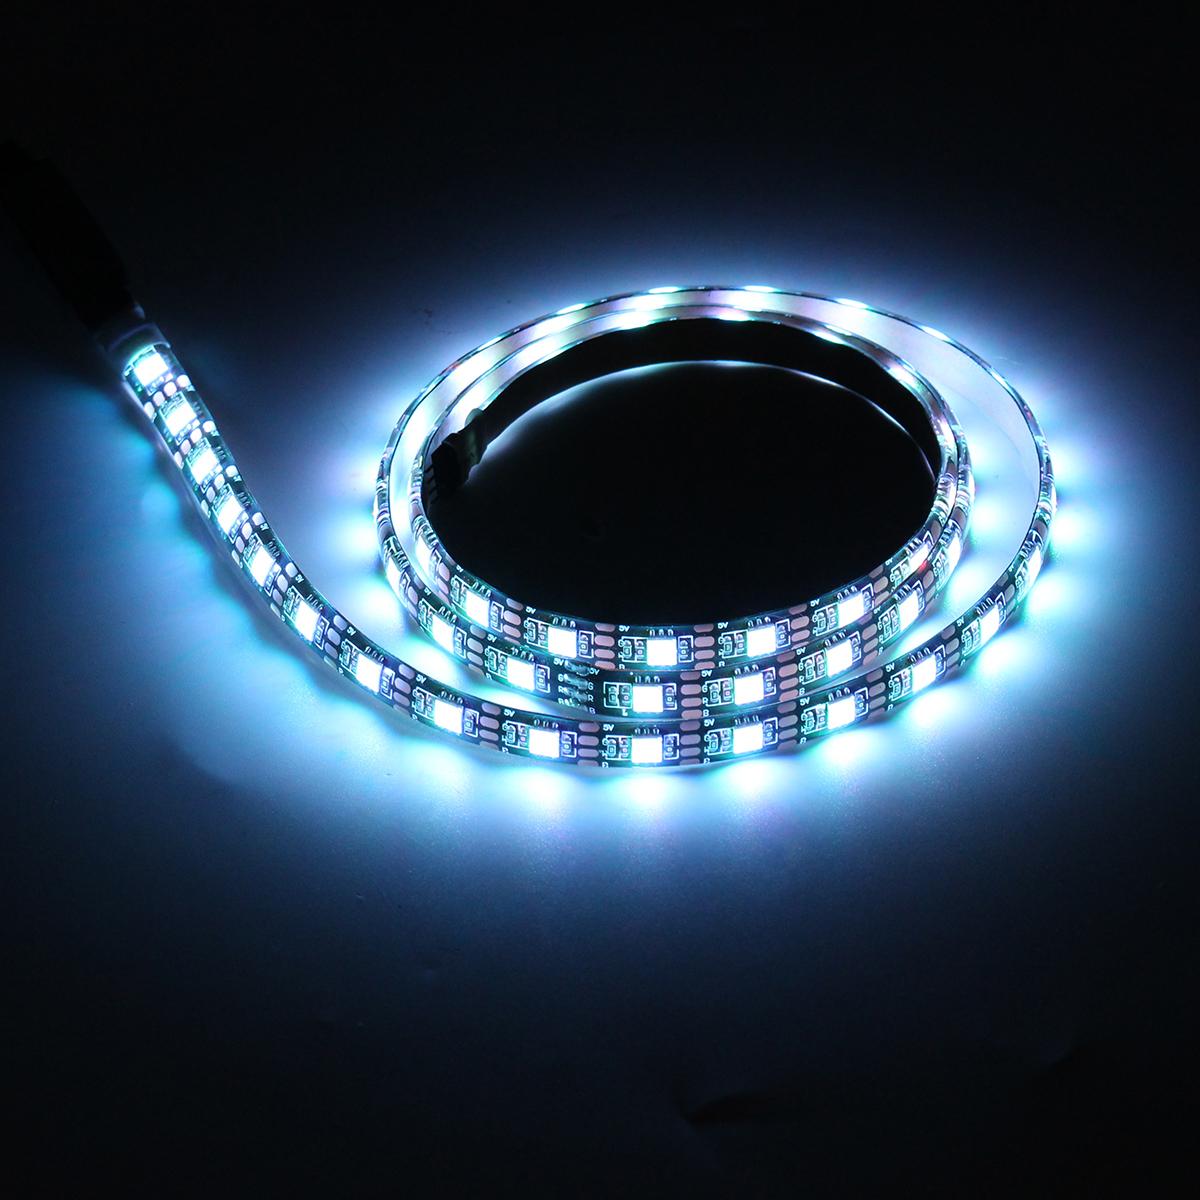 2x50CM + 2x100CM USB SMD5050 RGB LED Strip Light TV Backlight Bar Kit + Remote Control for DC5V